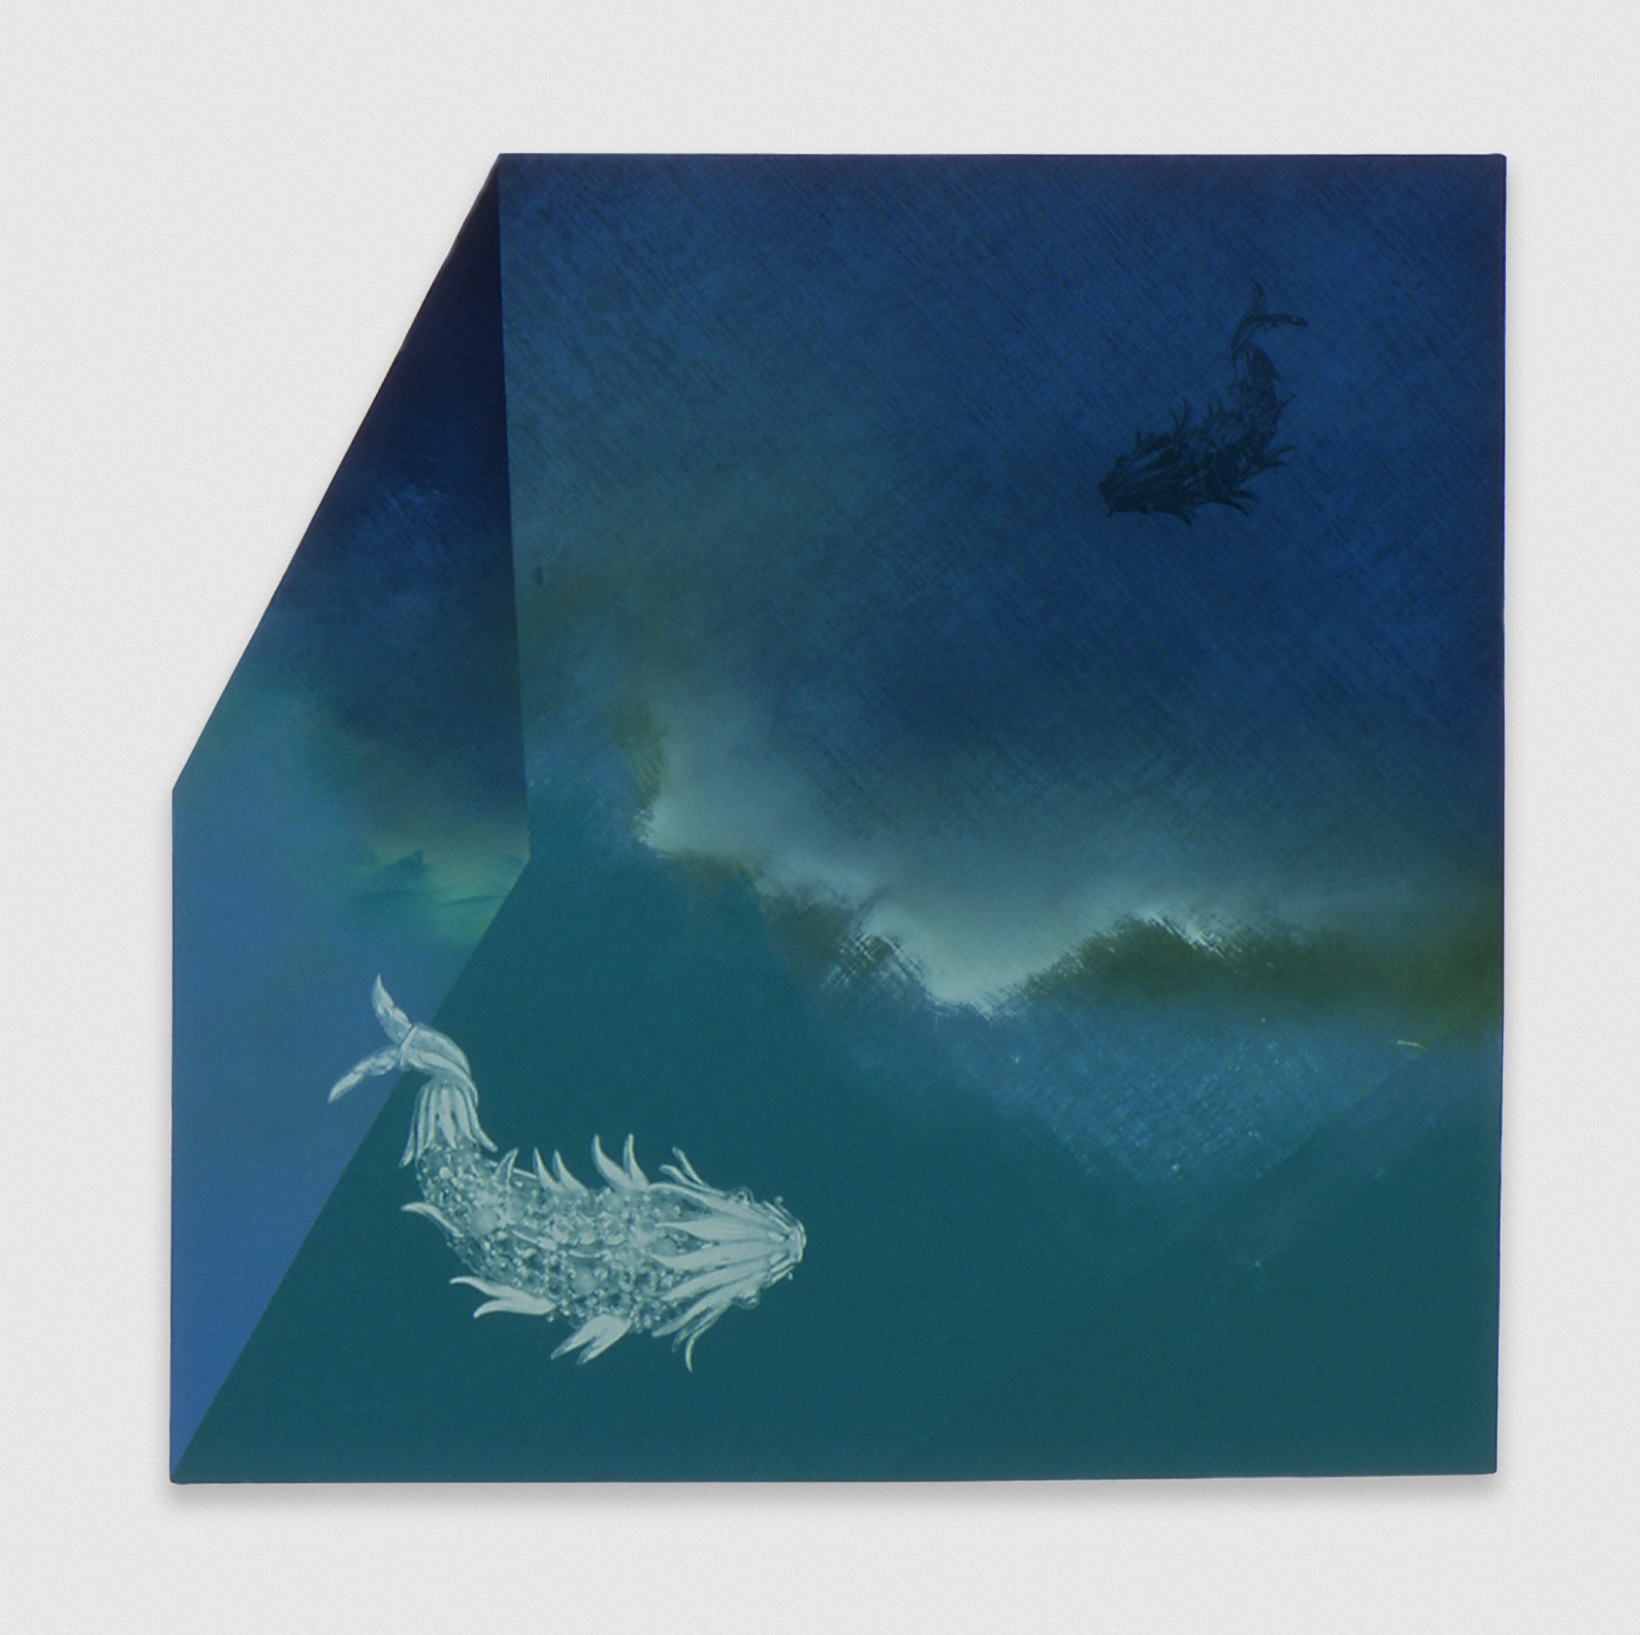 Kim Fisher  Tourmaline, 4  2004 Oil on linen 29h x 29w in KF004